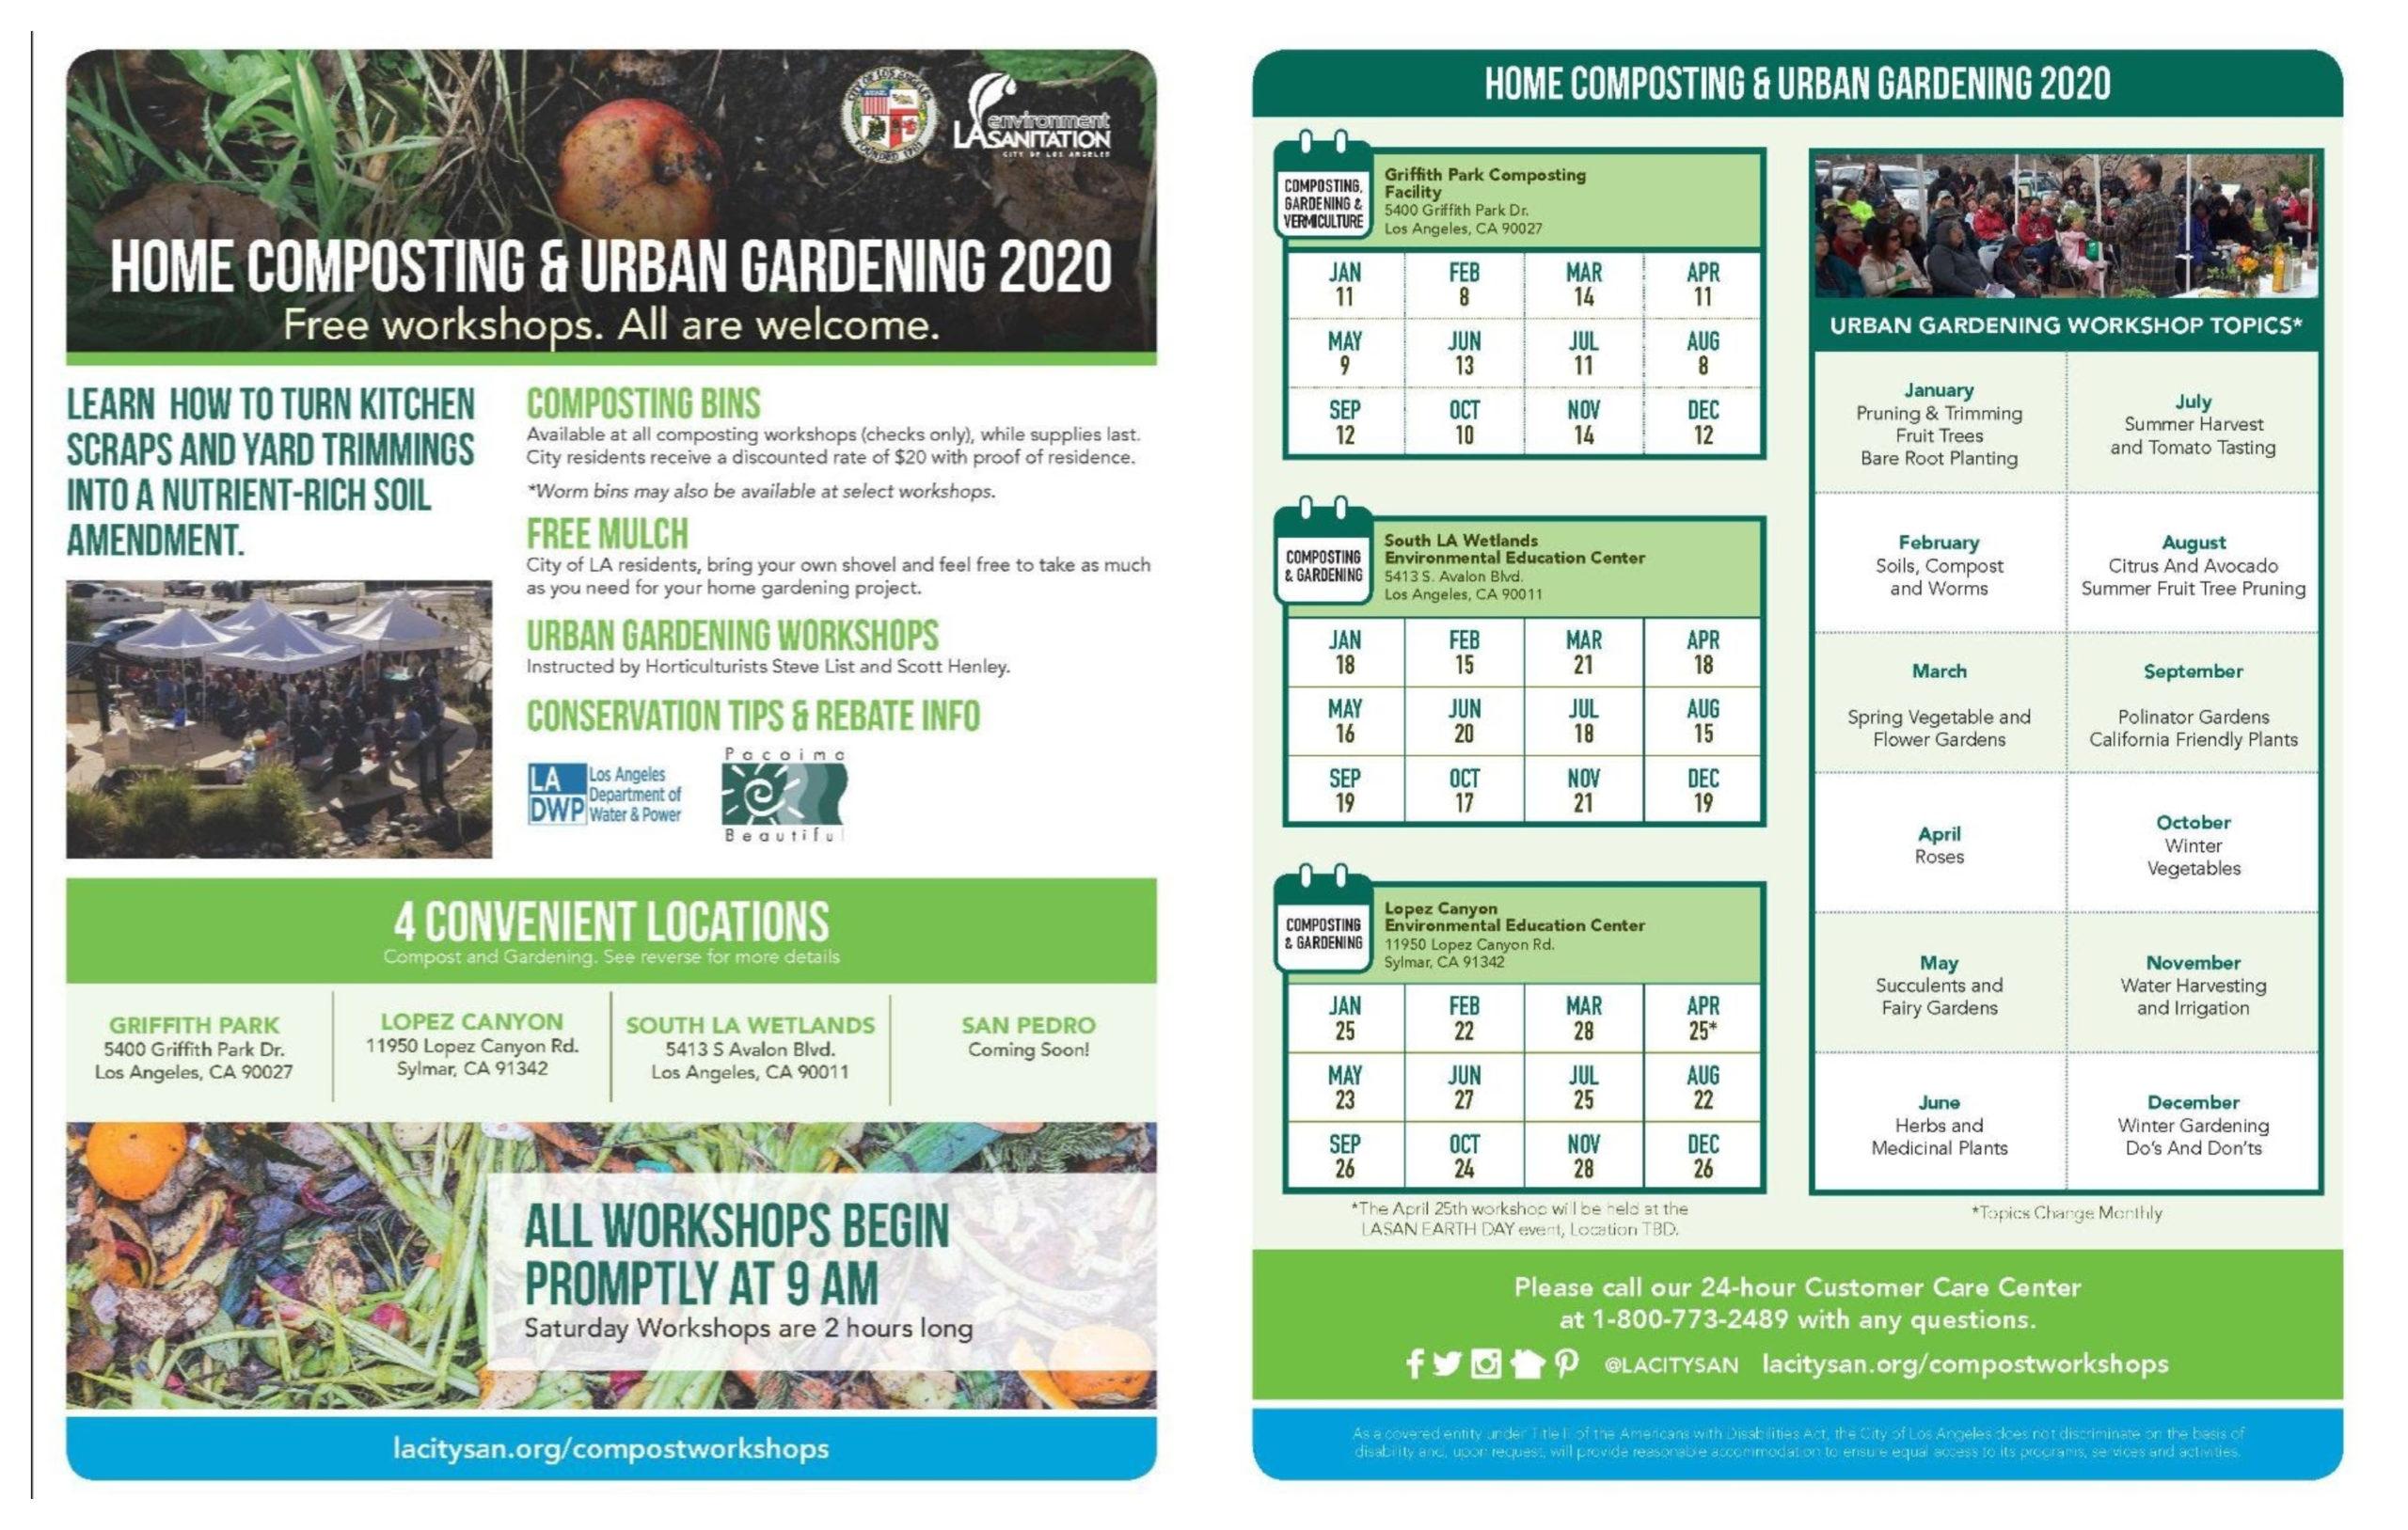 home composting & urban gardening 2020